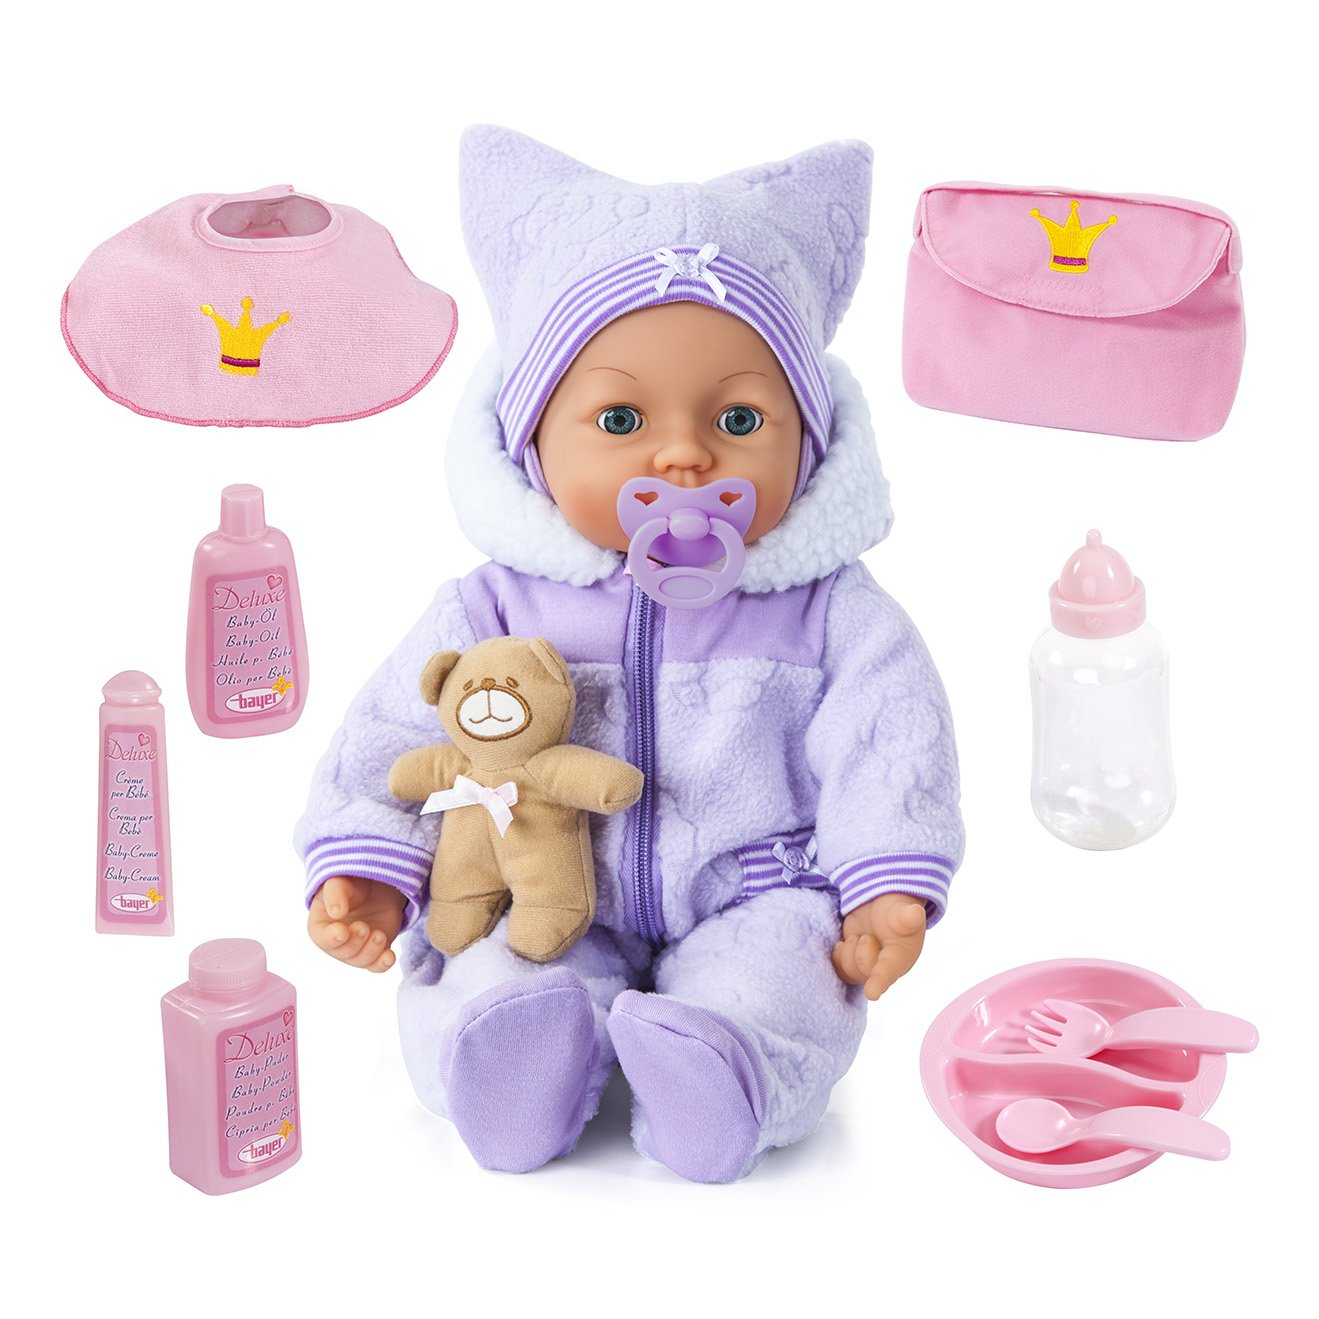 100% garantía genuina de contador Bayer Design - - - Muñeca bebé Piccolina Magic Eyes con cuerpo blando (94694AA)  clásico atemporal